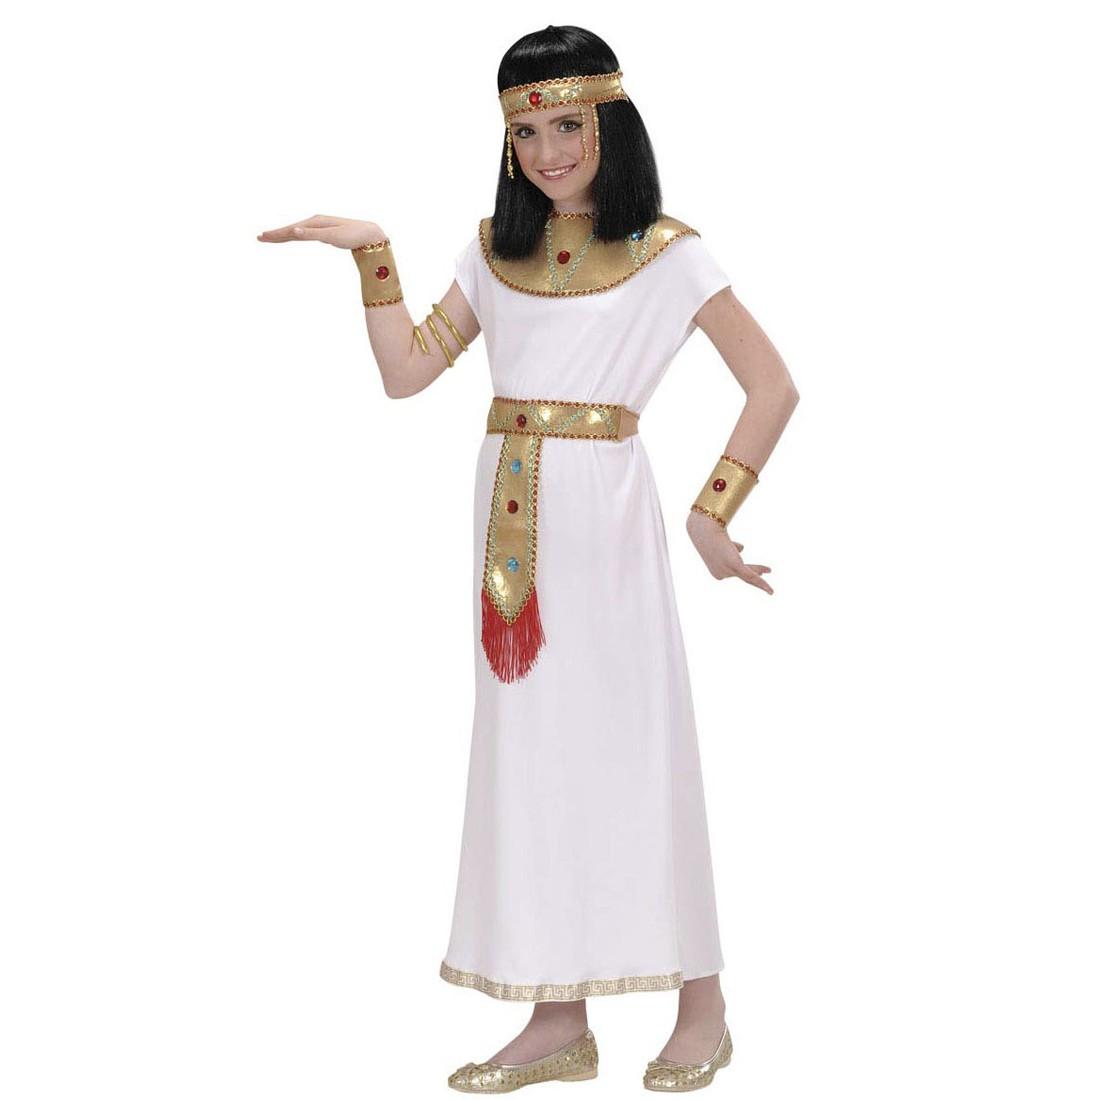 cleopatra kost m gypterin kinderkost m pharaonin. Black Bedroom Furniture Sets. Home Design Ideas